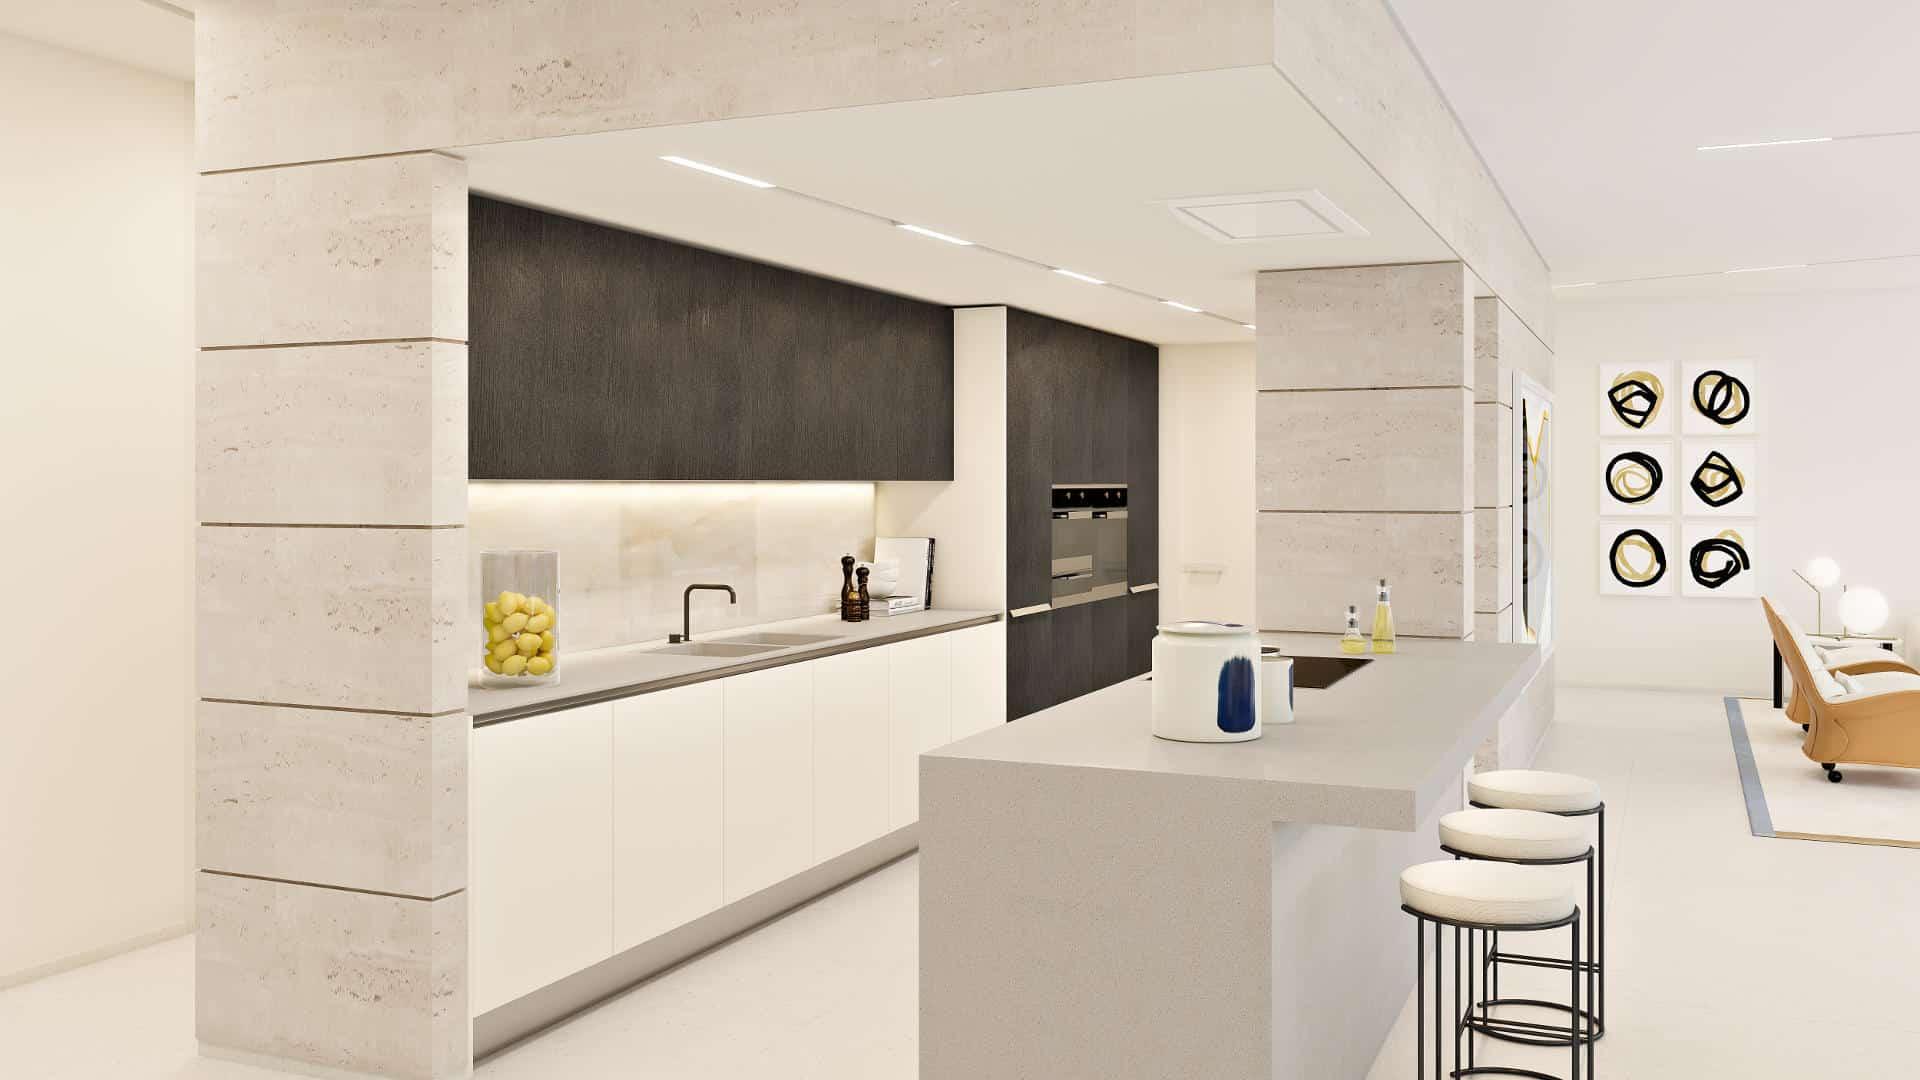 Two Bedroom Apartment For Sale Marbella New Build La Meridiana Suites Realista